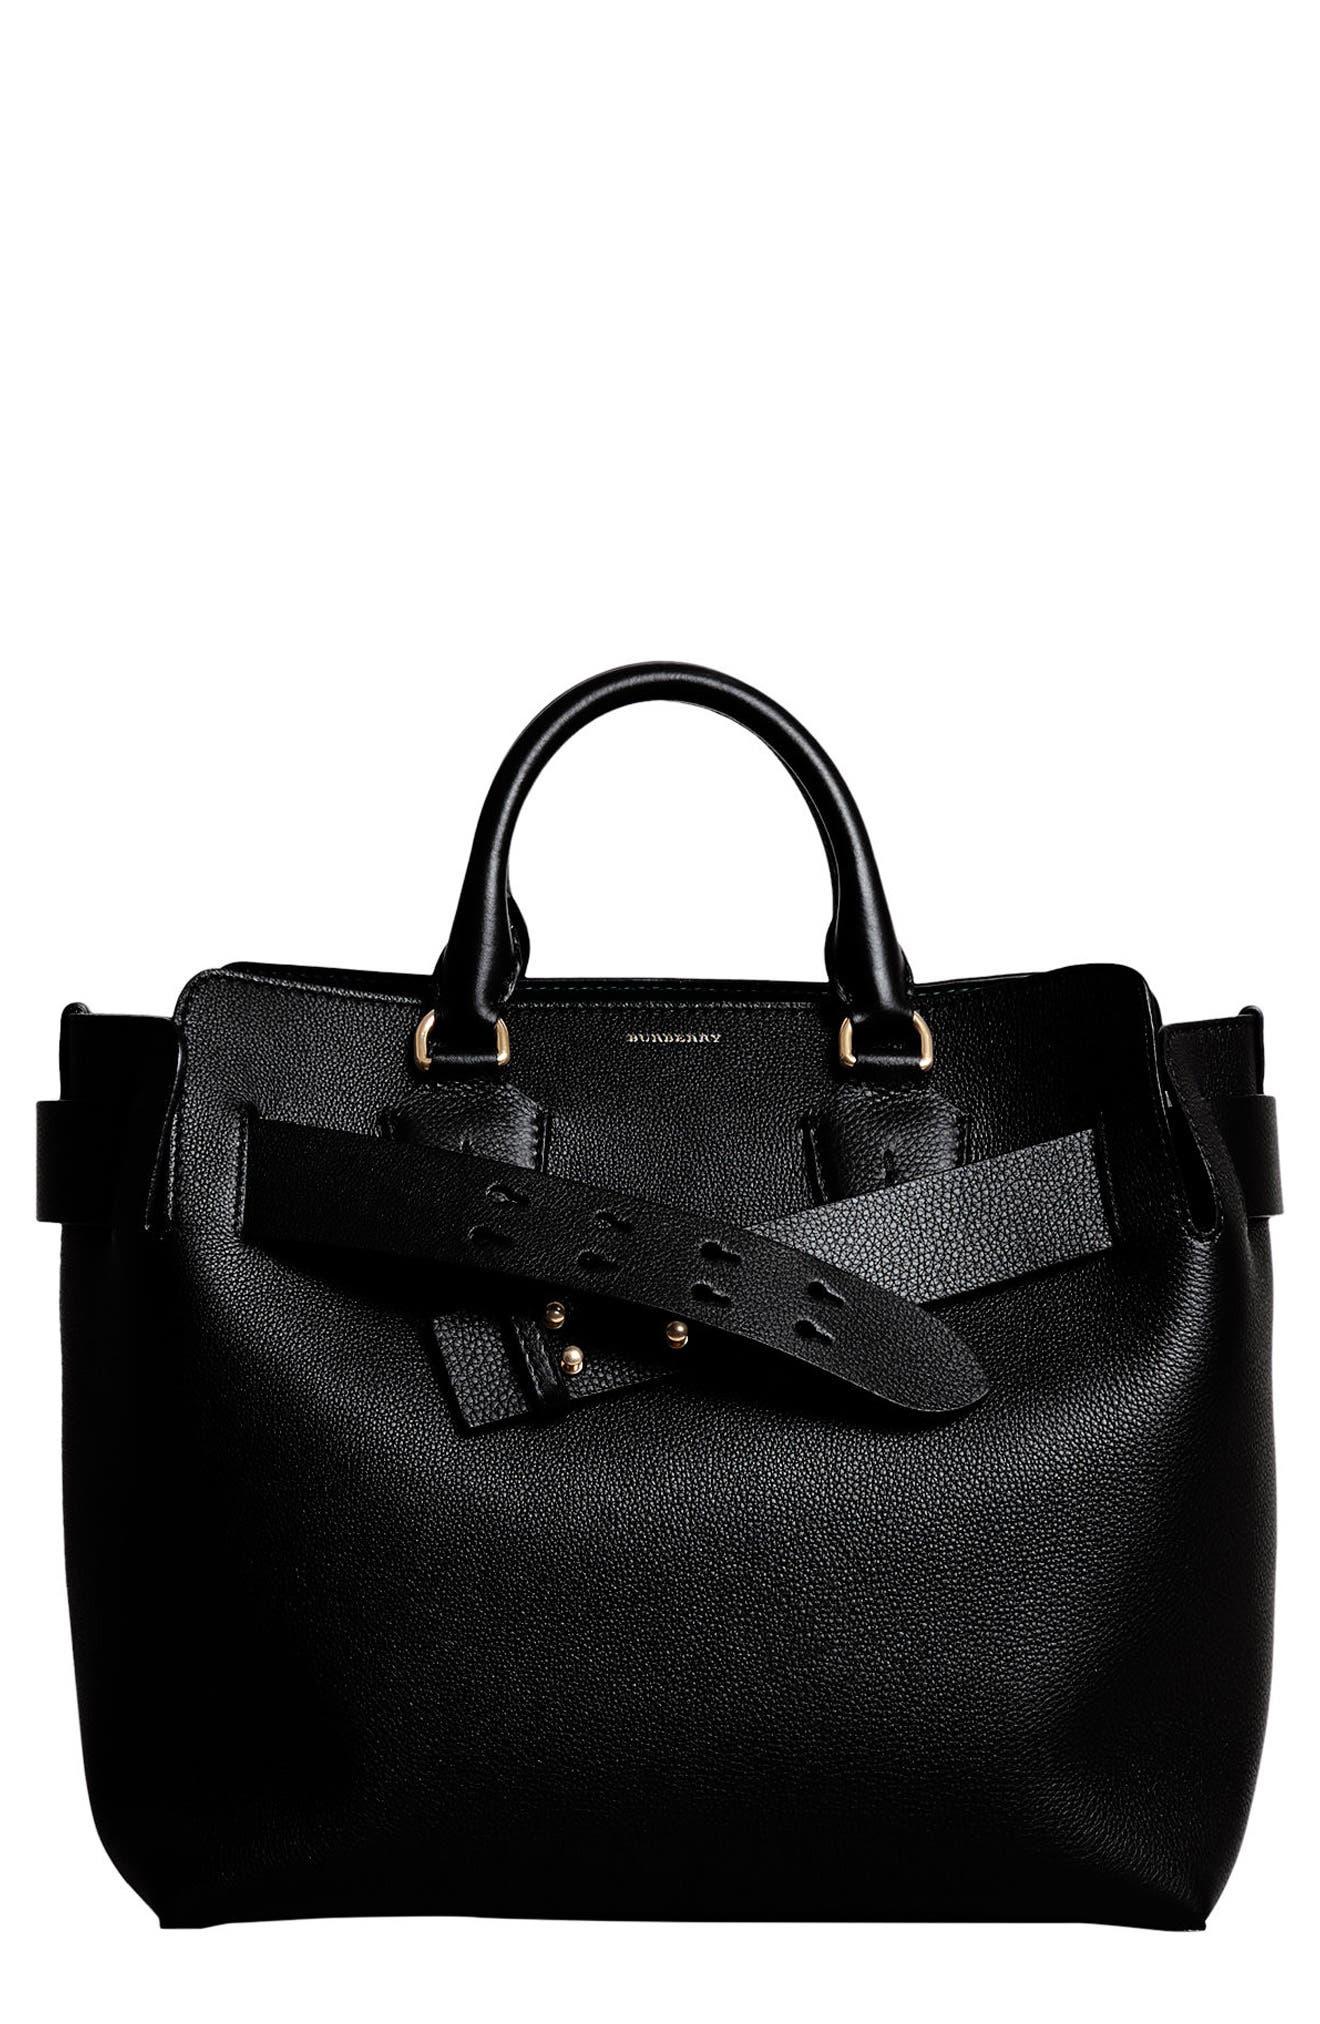 Medium Belt Bag Leather Tote,                             Main thumbnail 1, color,                             001